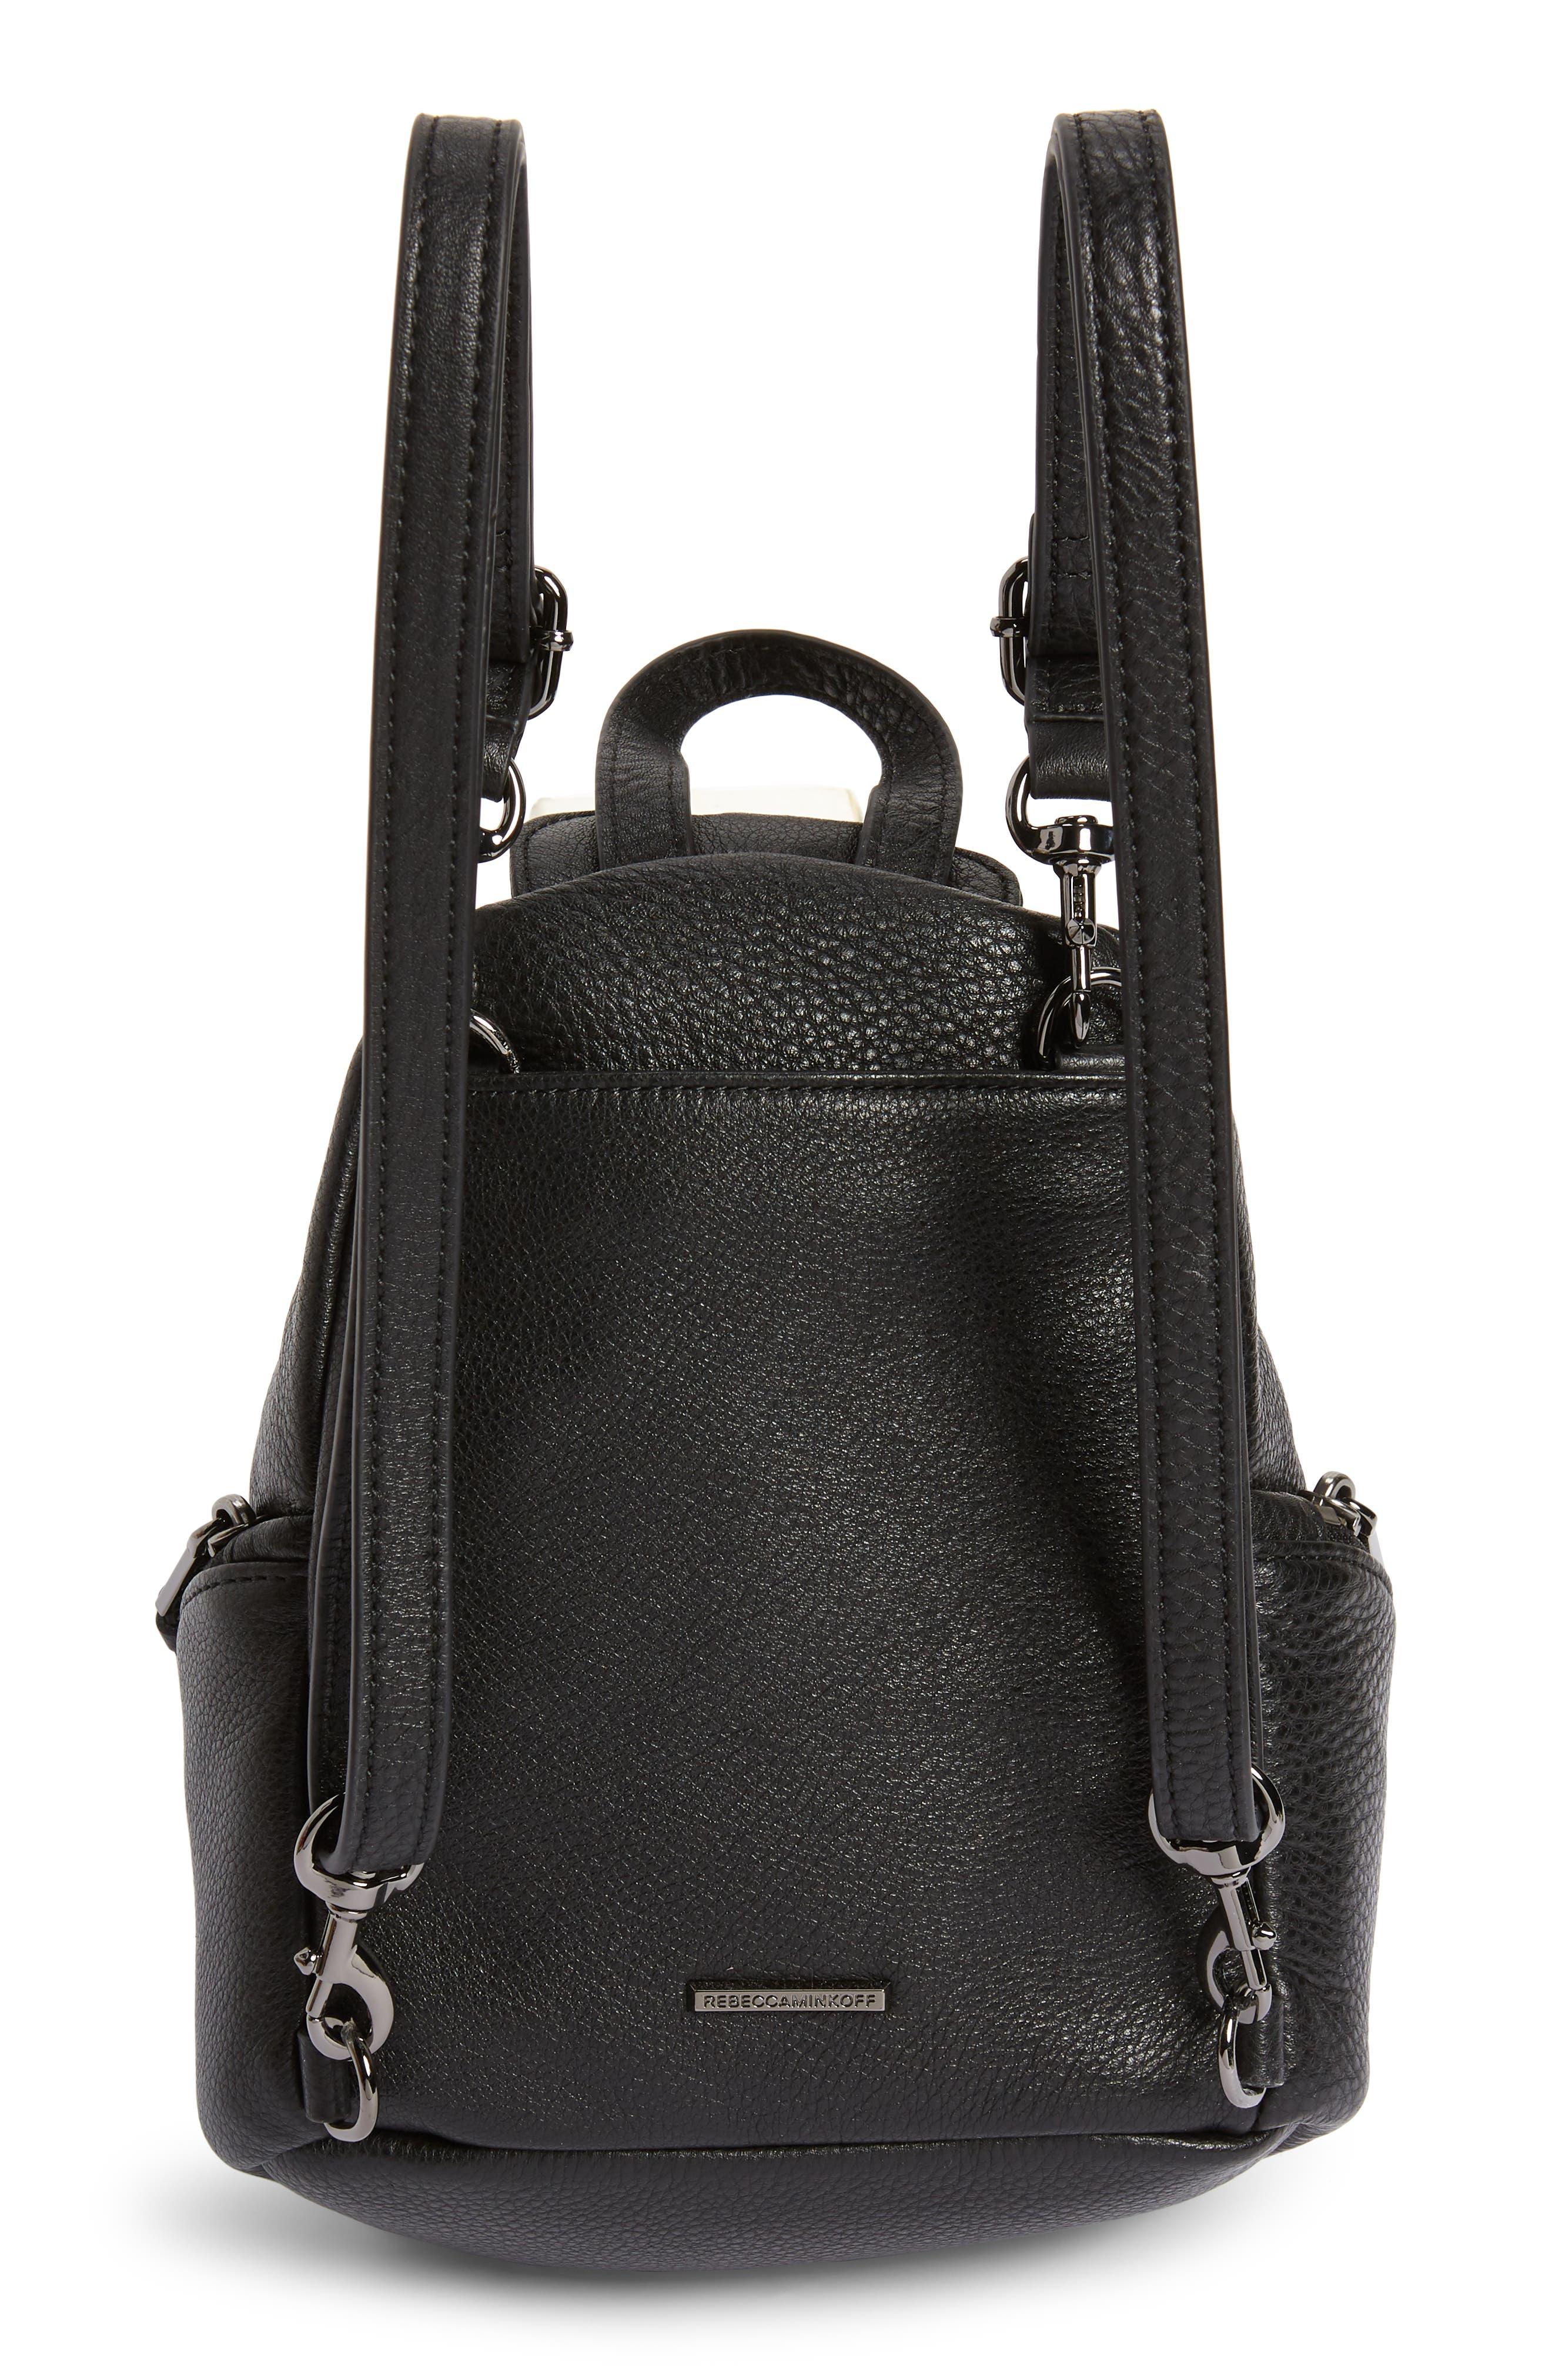 REBECCA MINKOFF, Mini Julian Pebbled Leather Convertible Backpack, Alternate thumbnail 5, color, BLACK